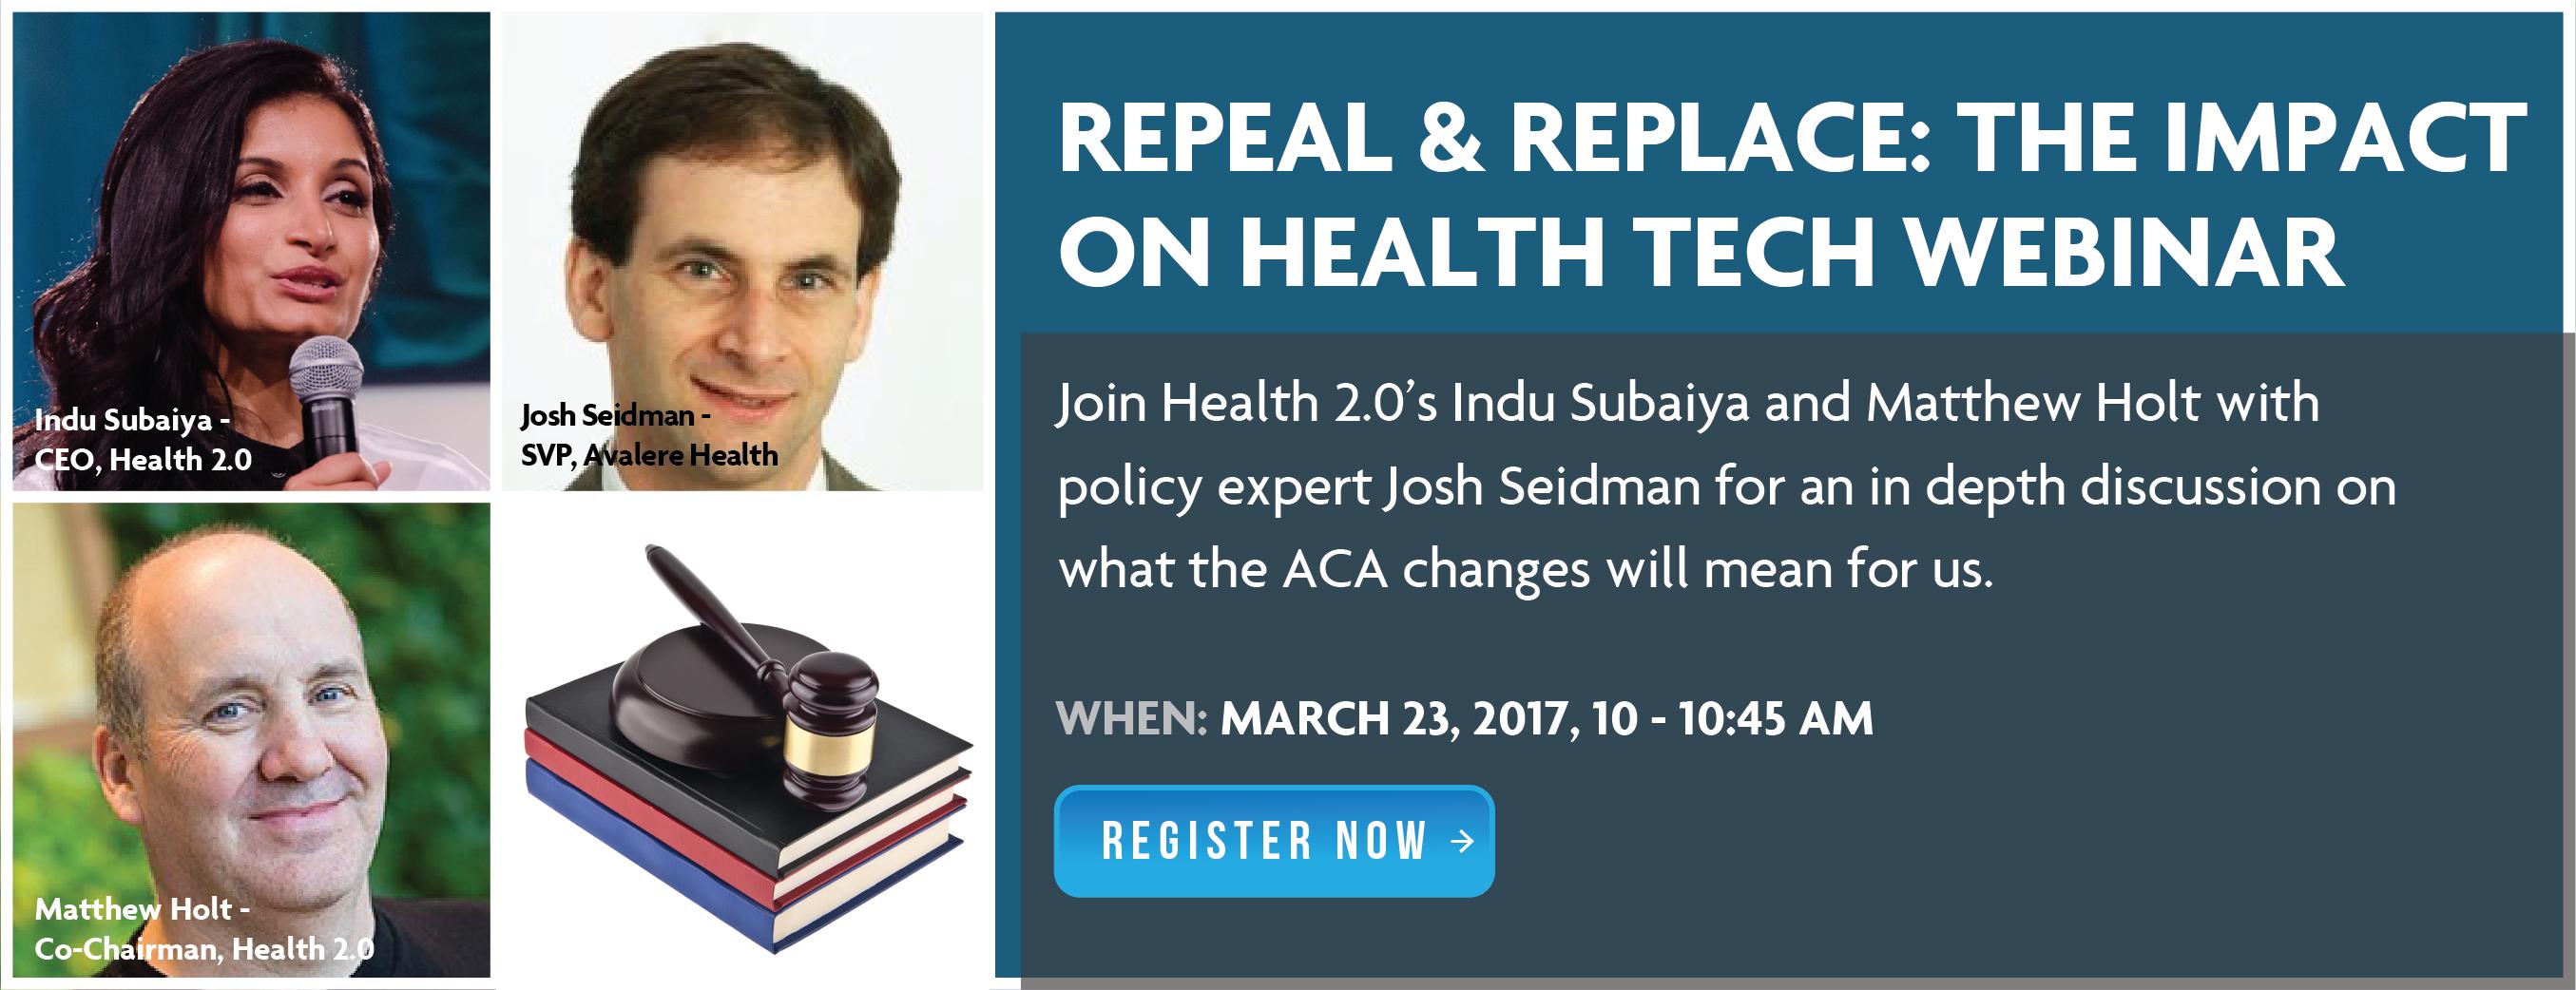 ACA Impact on Health Tech